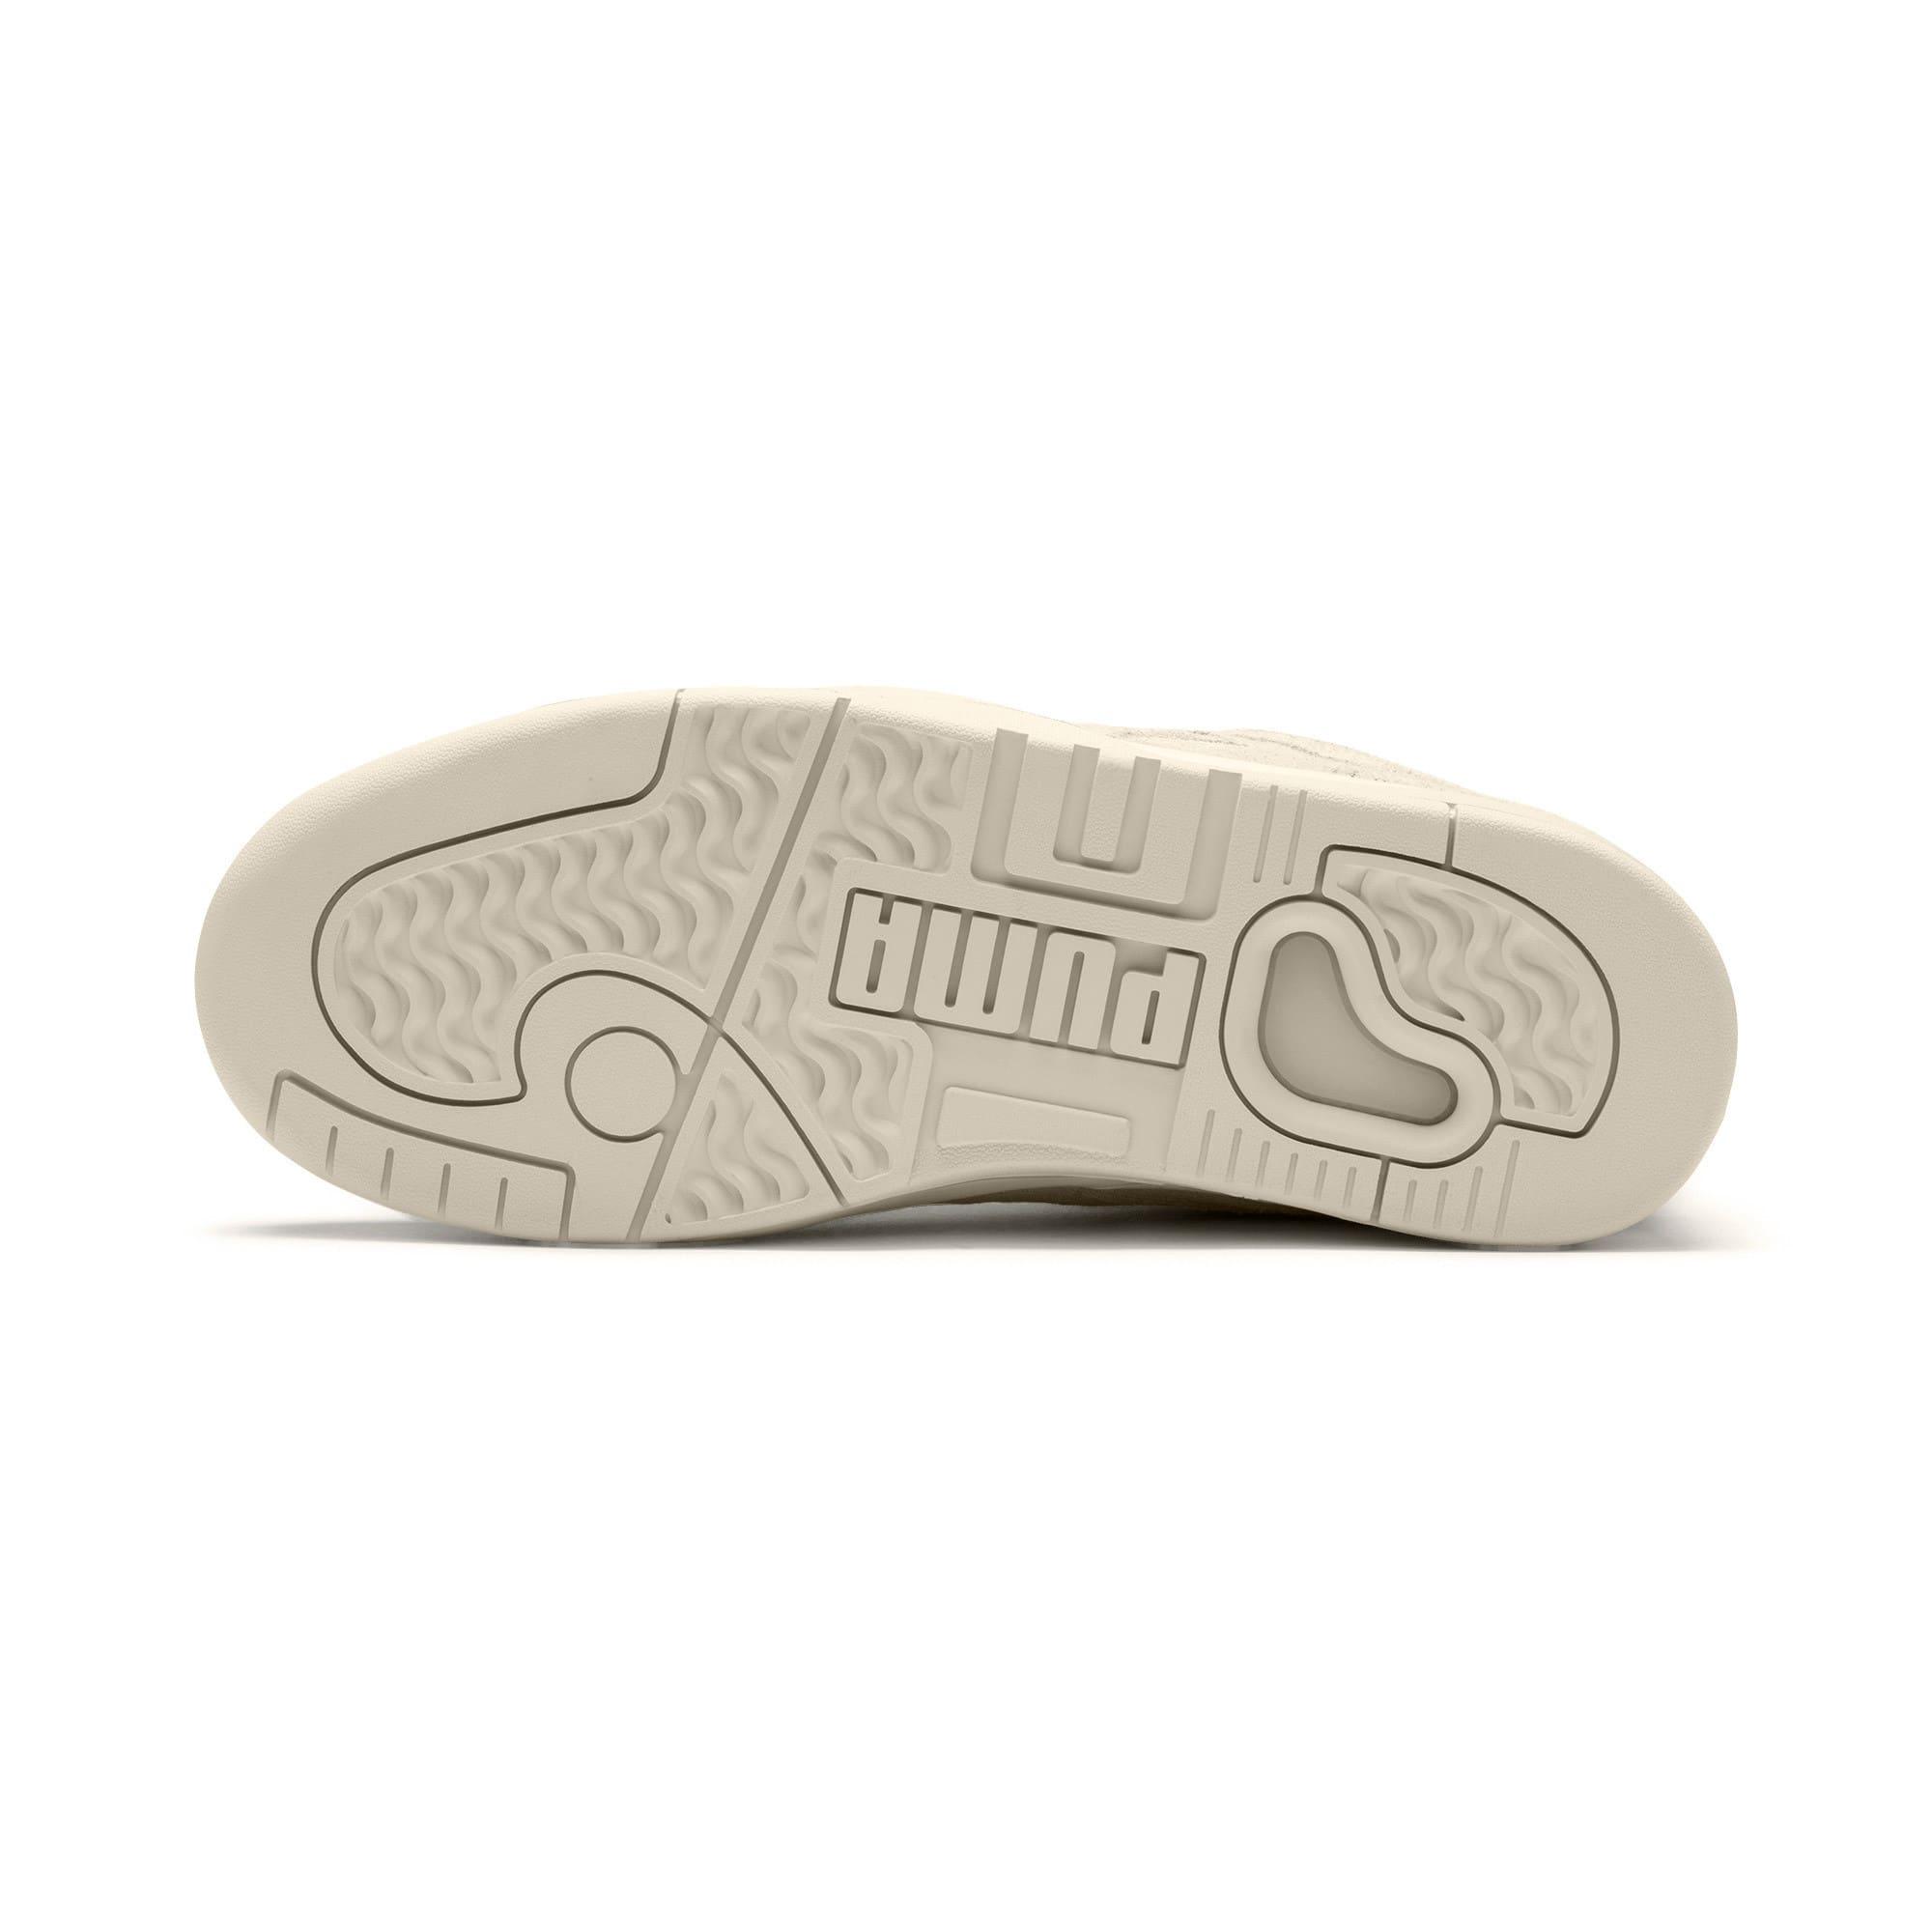 Thumbnail 4 of Palace Guard 4th of July Sneakers, Whisper White-Puma Black, medium